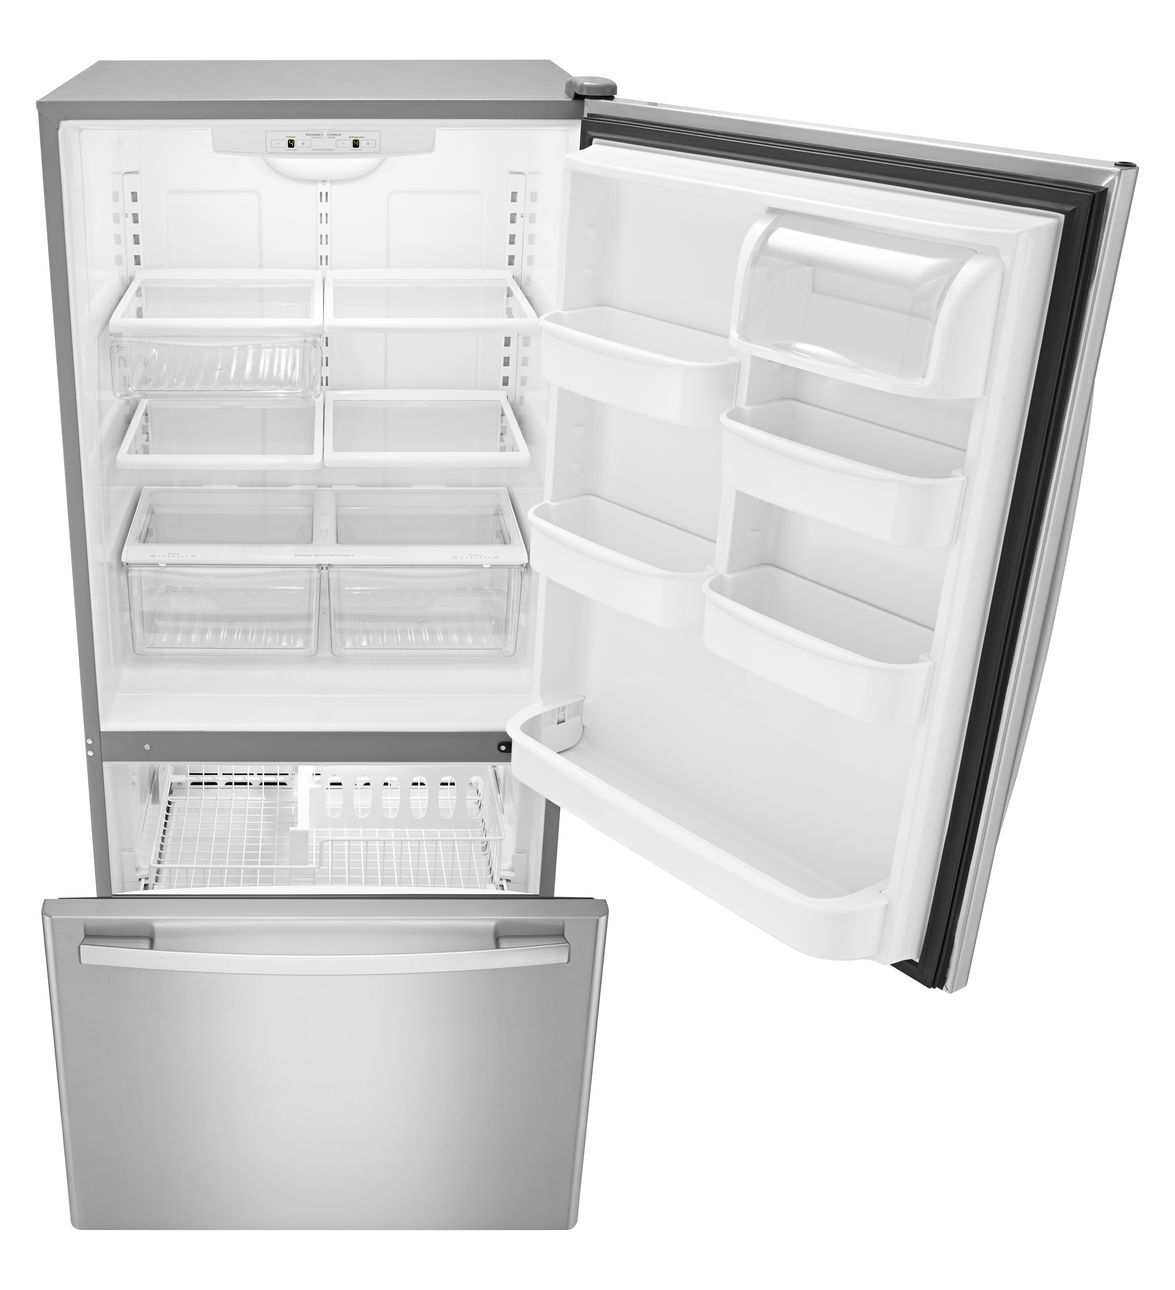 ABB2224BRM Amana 33inch Wide Amana BottomFreezer Refrigerator